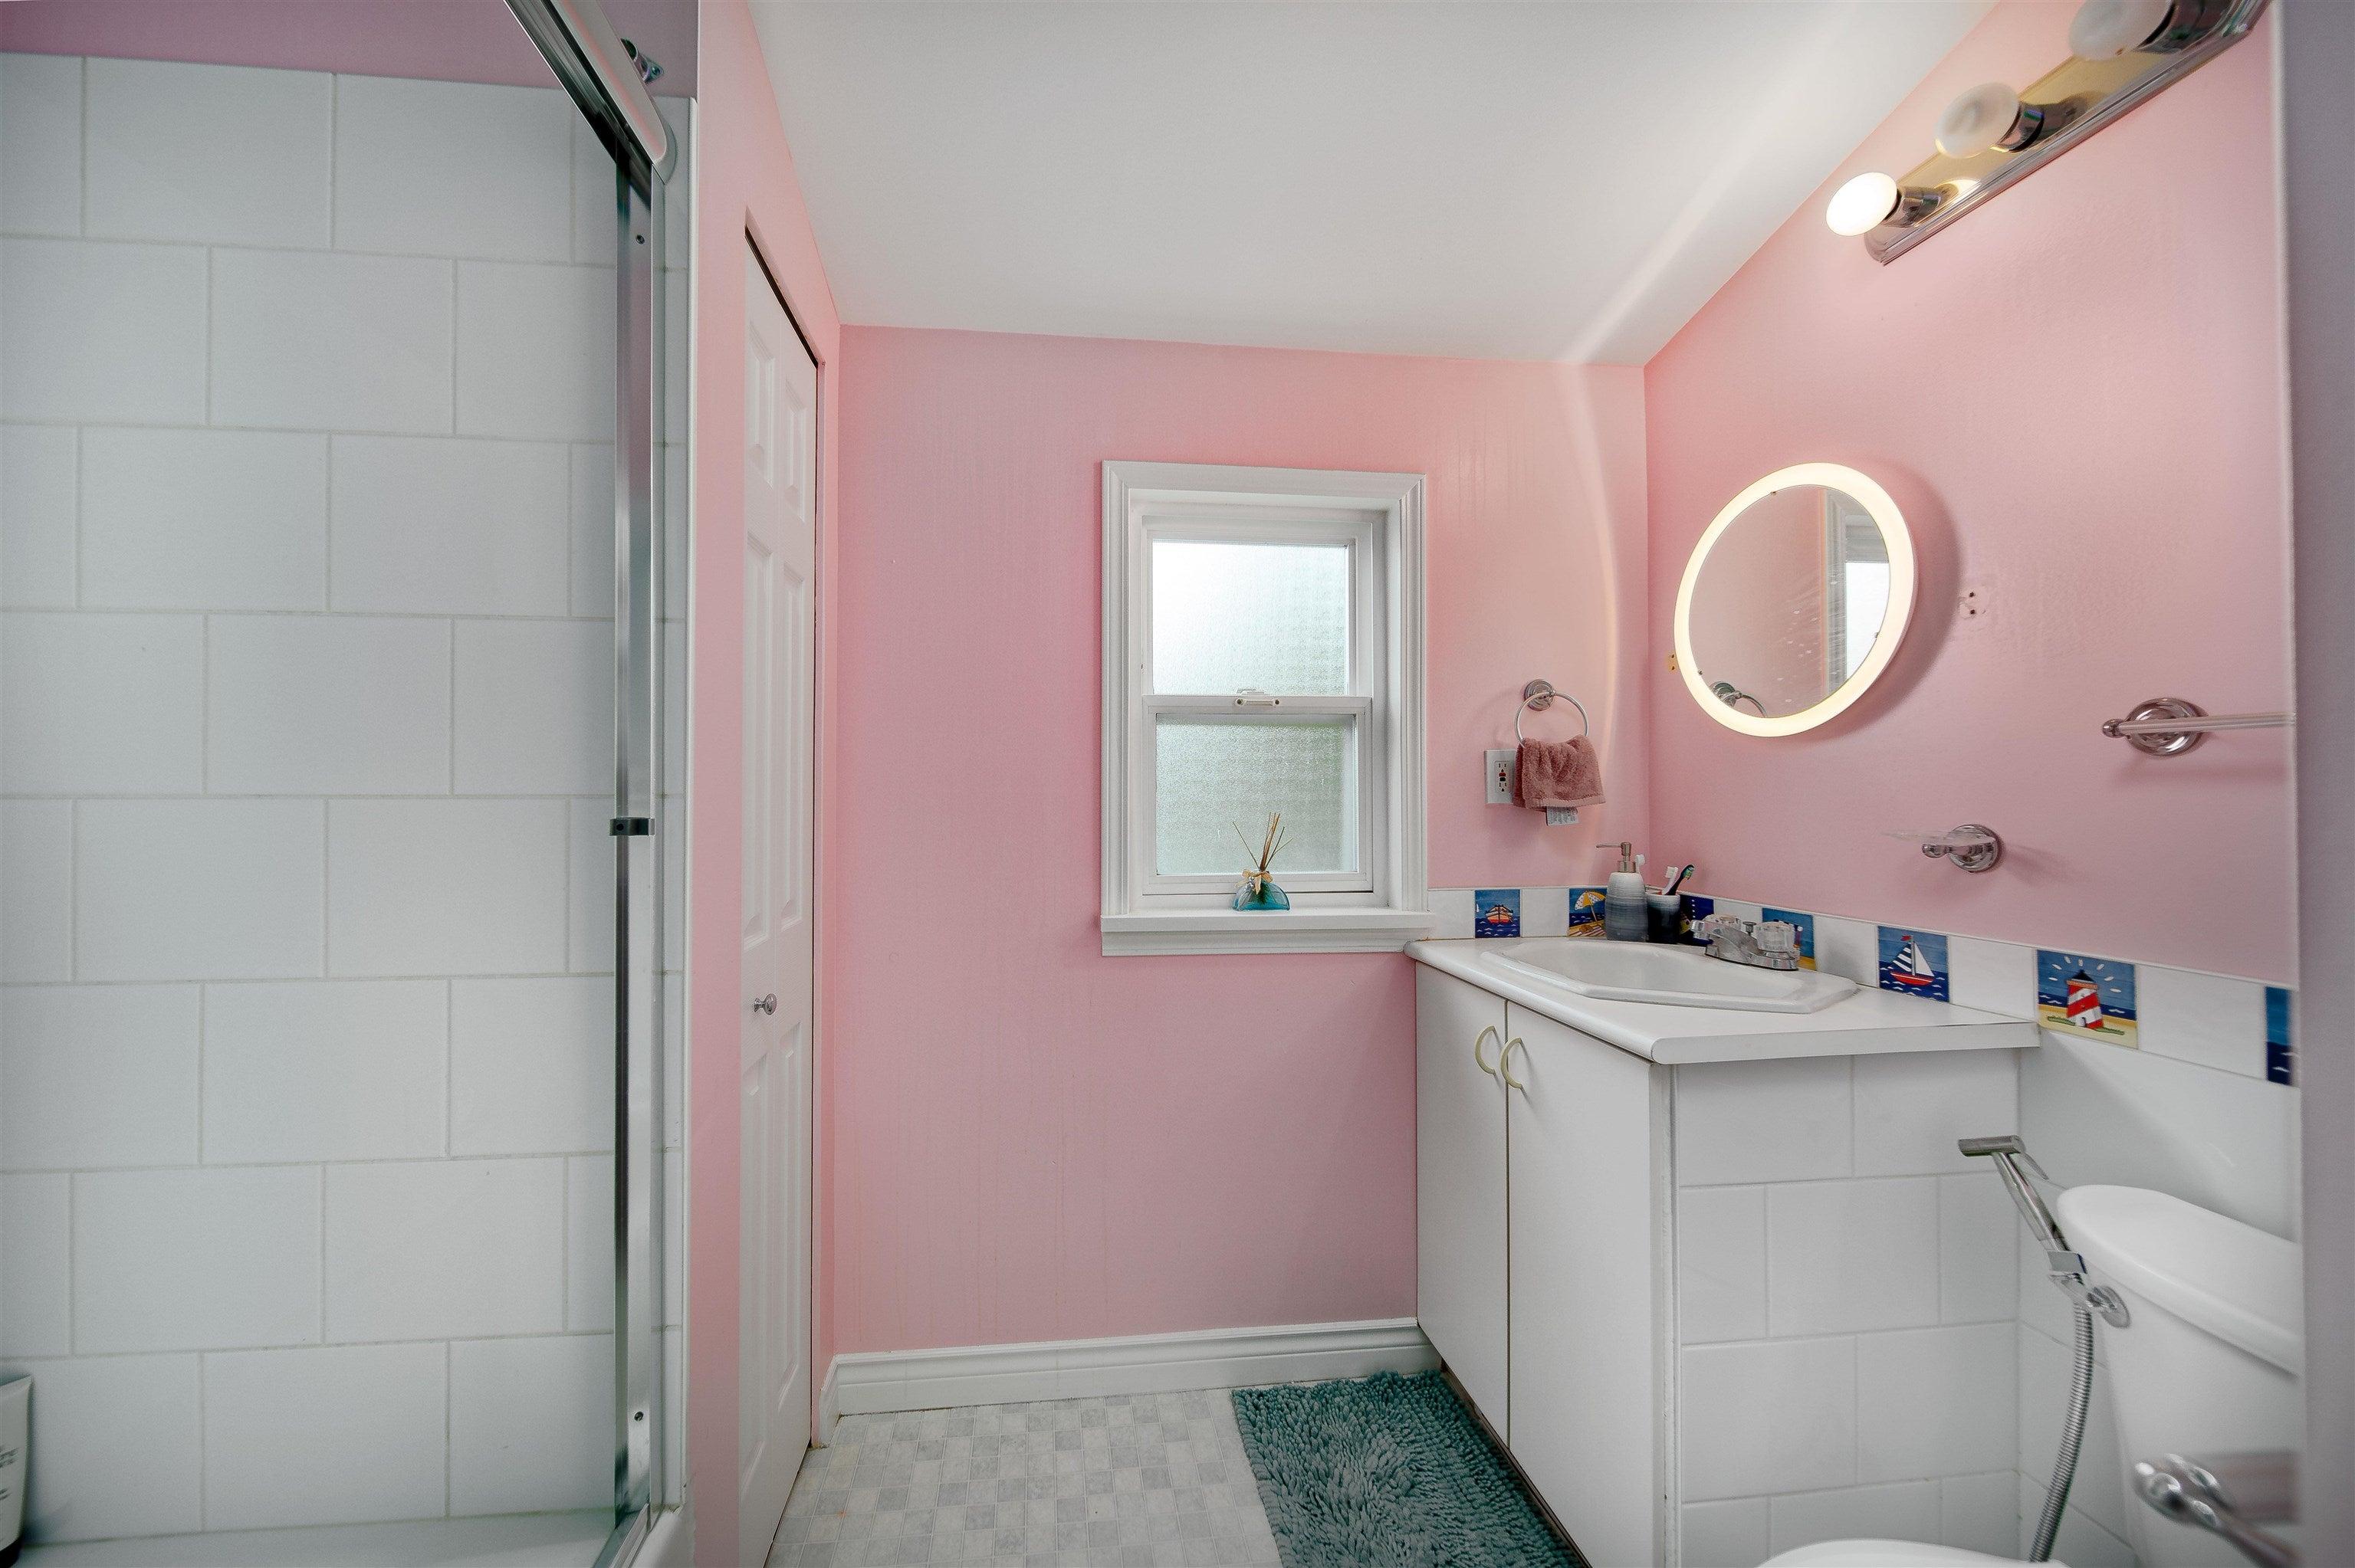 1357 FULTON AVENUE - Ambleside House/Single Family for sale, 6 Bedrooms (R2617731) - #25